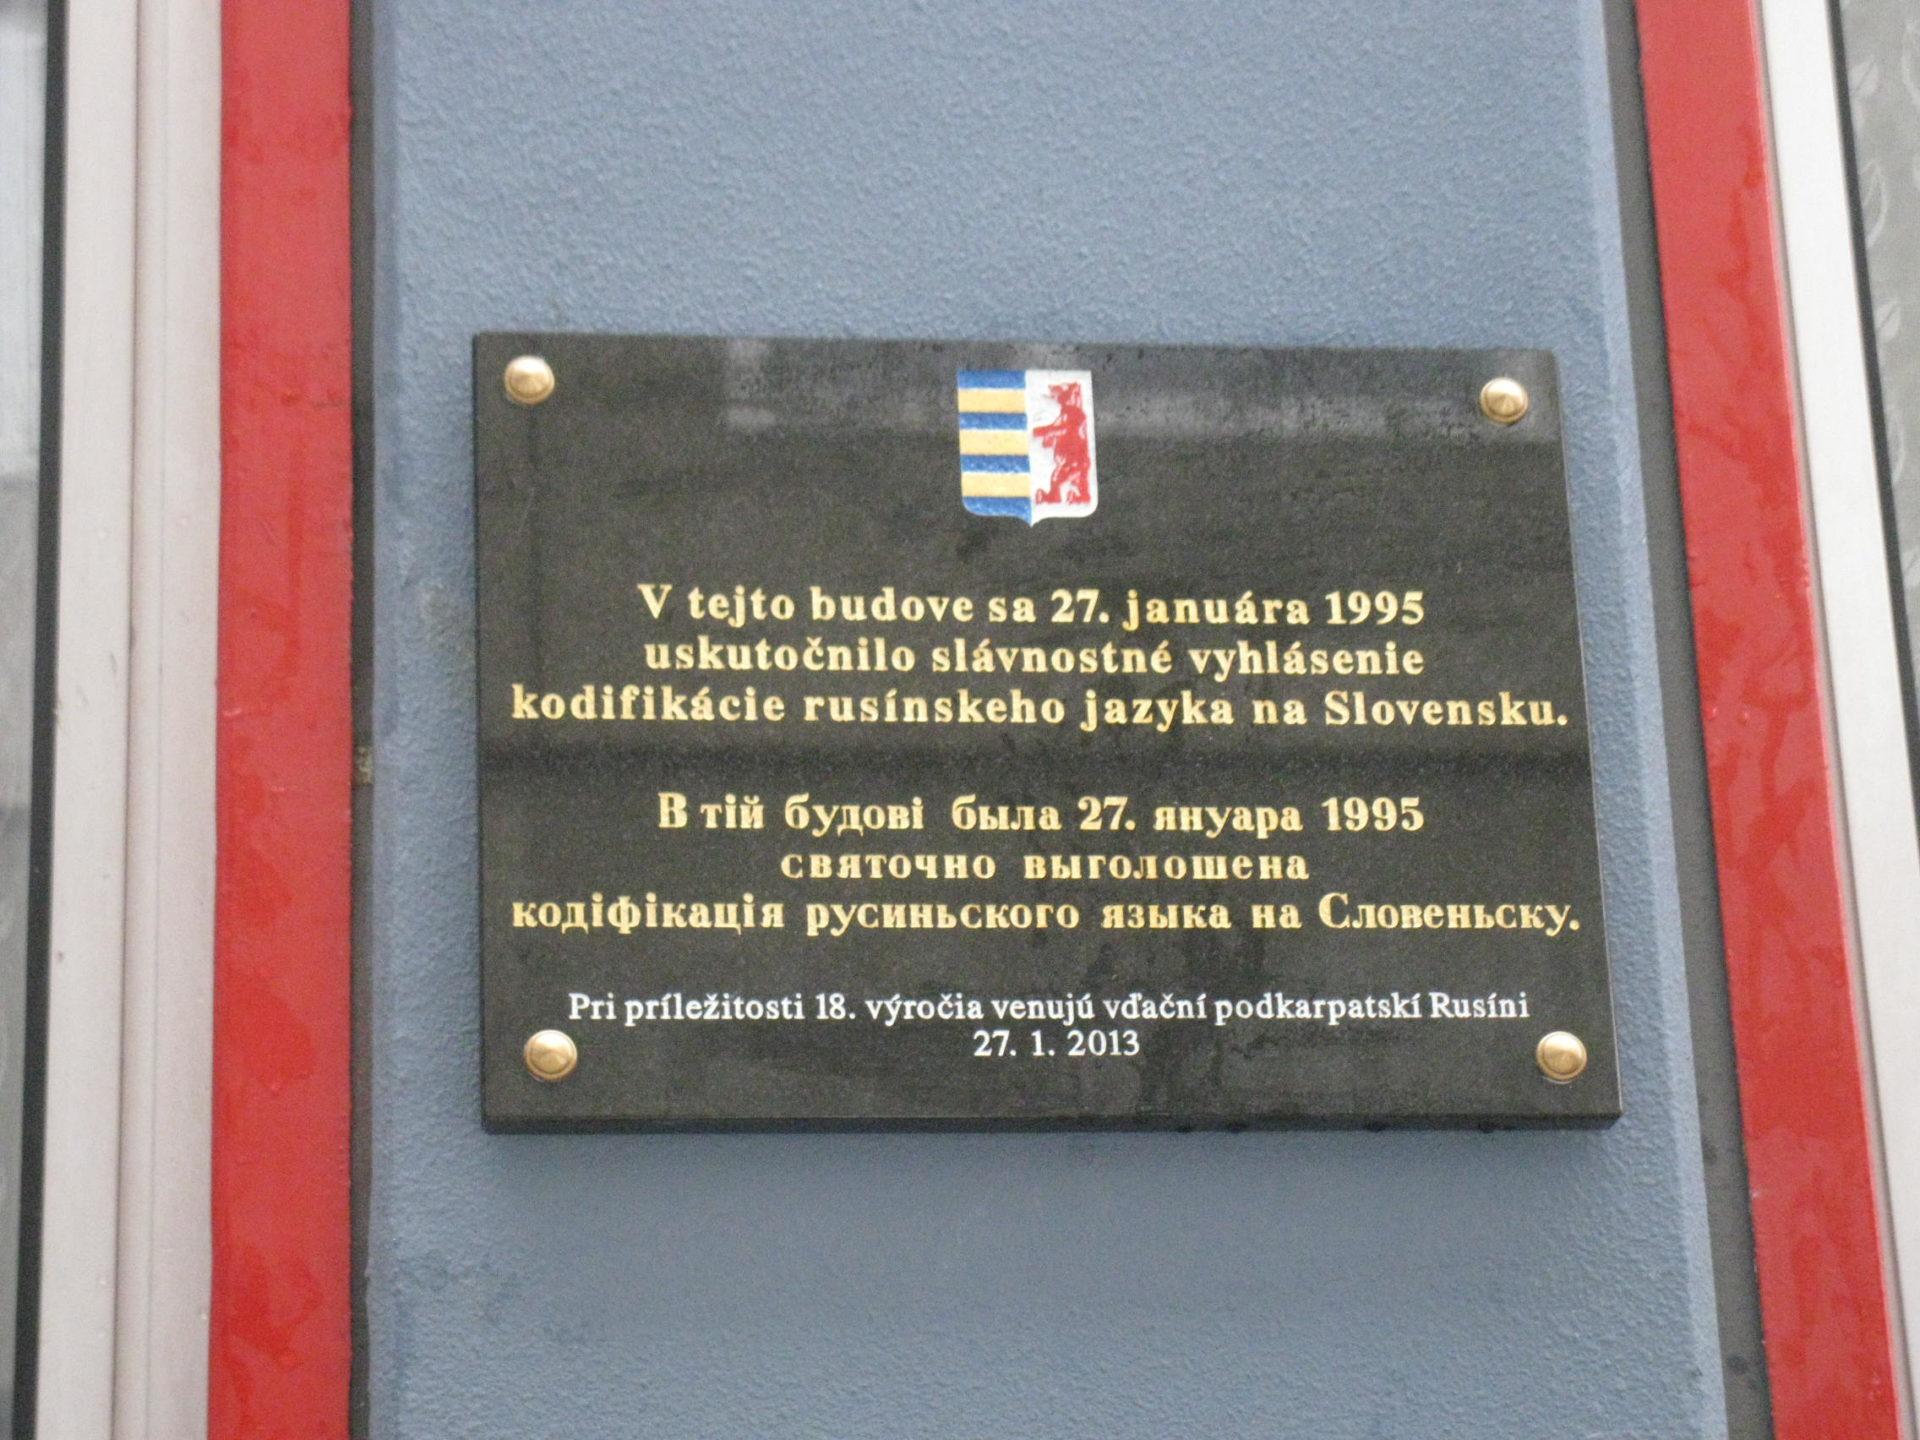 Табла на інтернаті Дружба в Братіславі, де была святочно выголошена кодіфікація русиньского літературного языка.